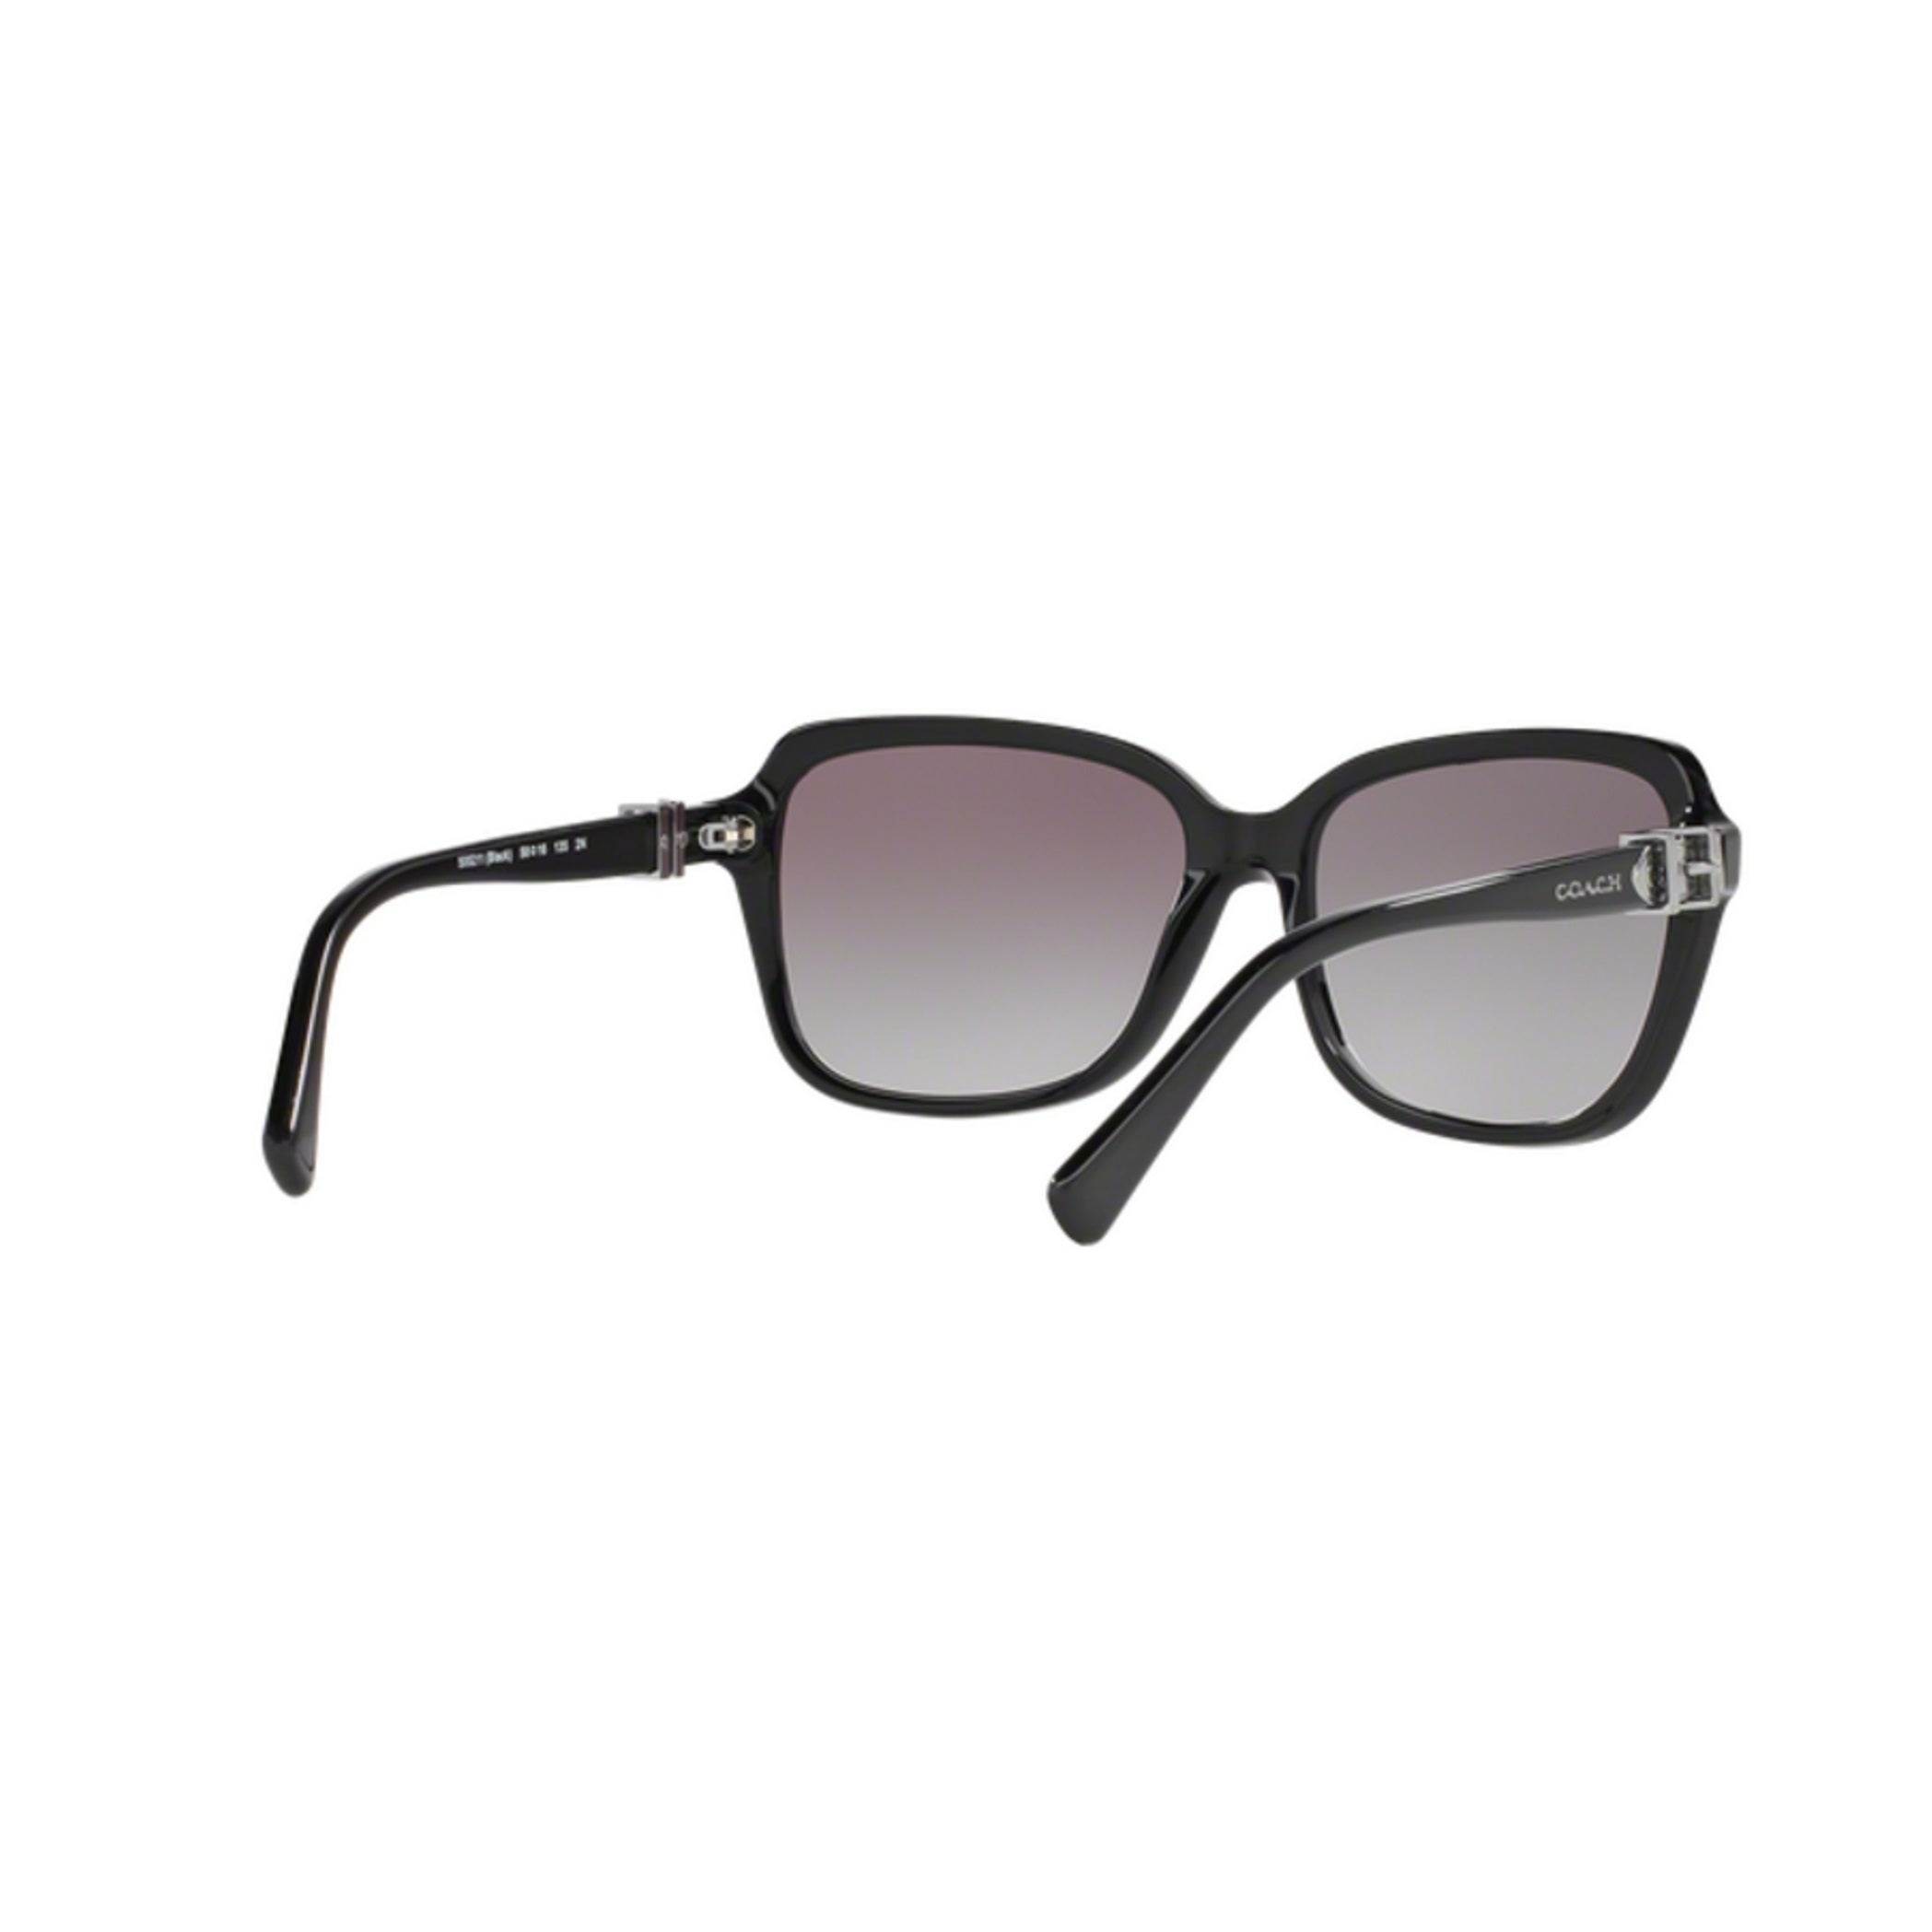 436d54747974e Shop Coach HC8179 L1598 500211 Black Womens Plastic Square Sunglasses -  Free Shipping Today - Overstock - 12647026